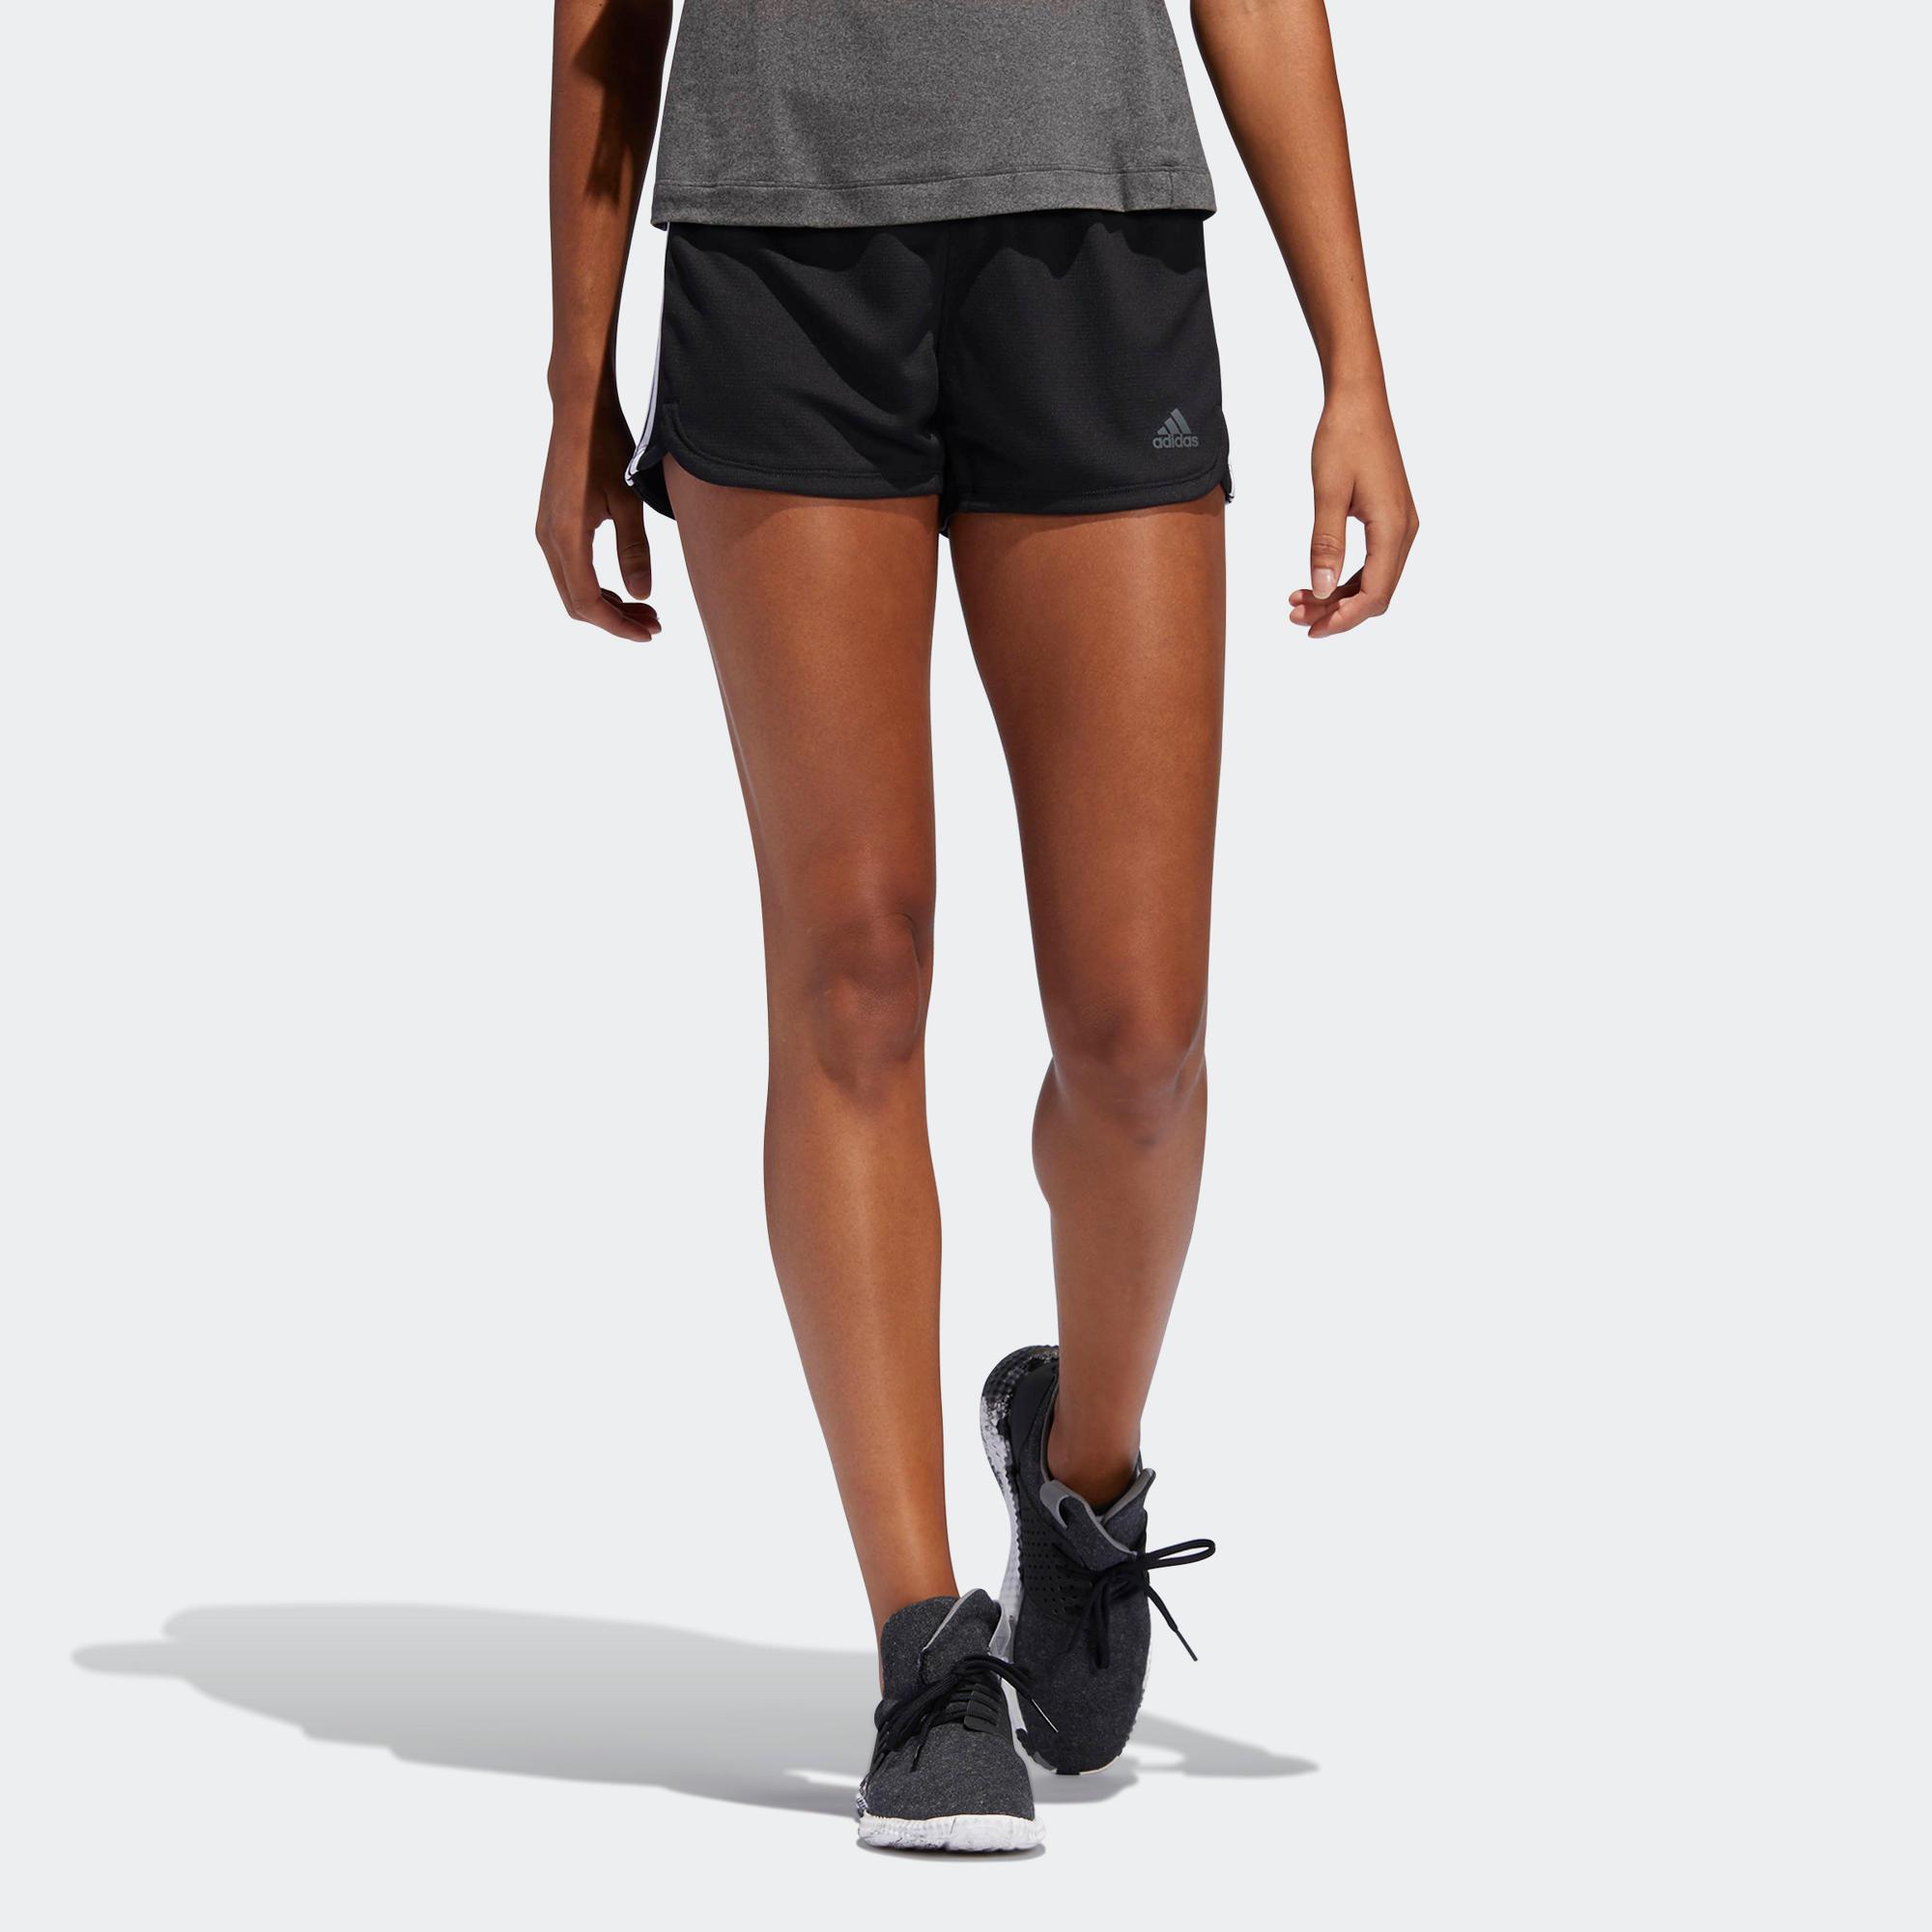 Şort Fitness Adidas Damă